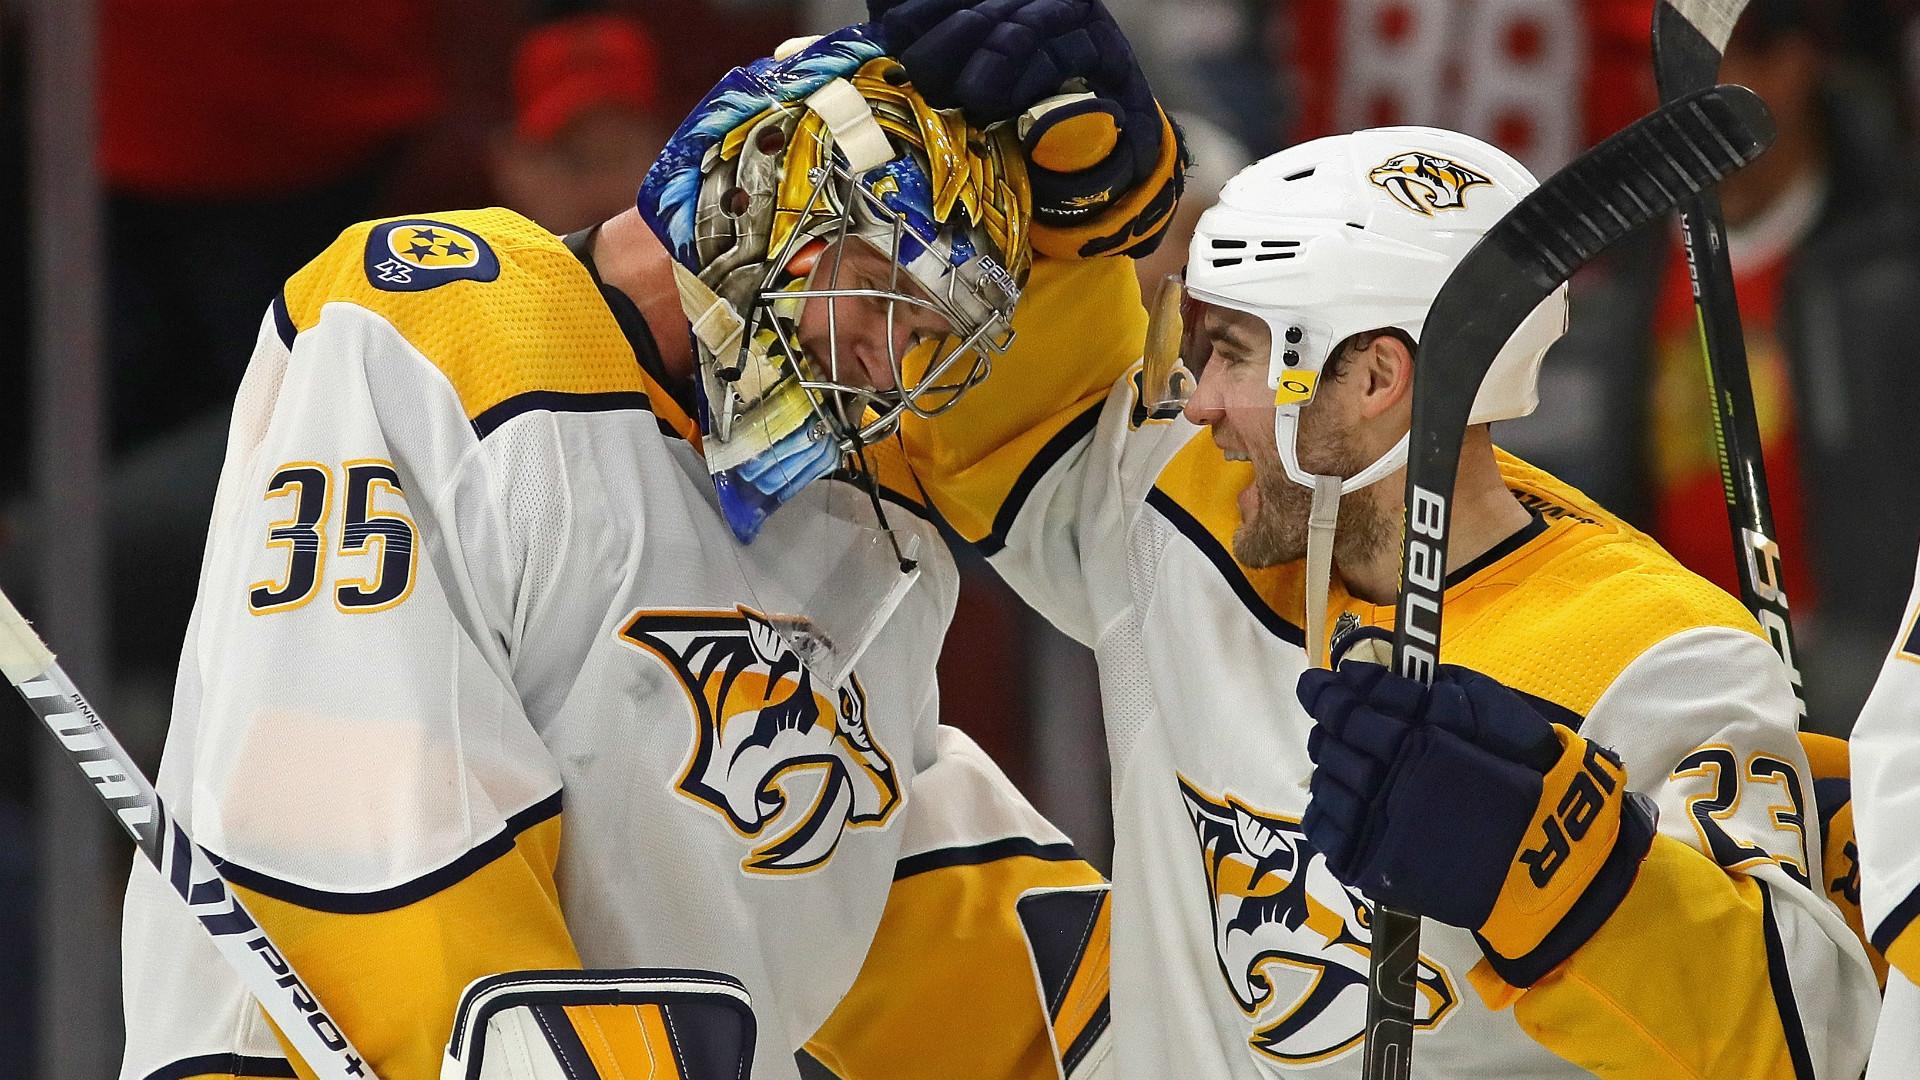 Pekka Rinne trouve le chemin du but — NHL